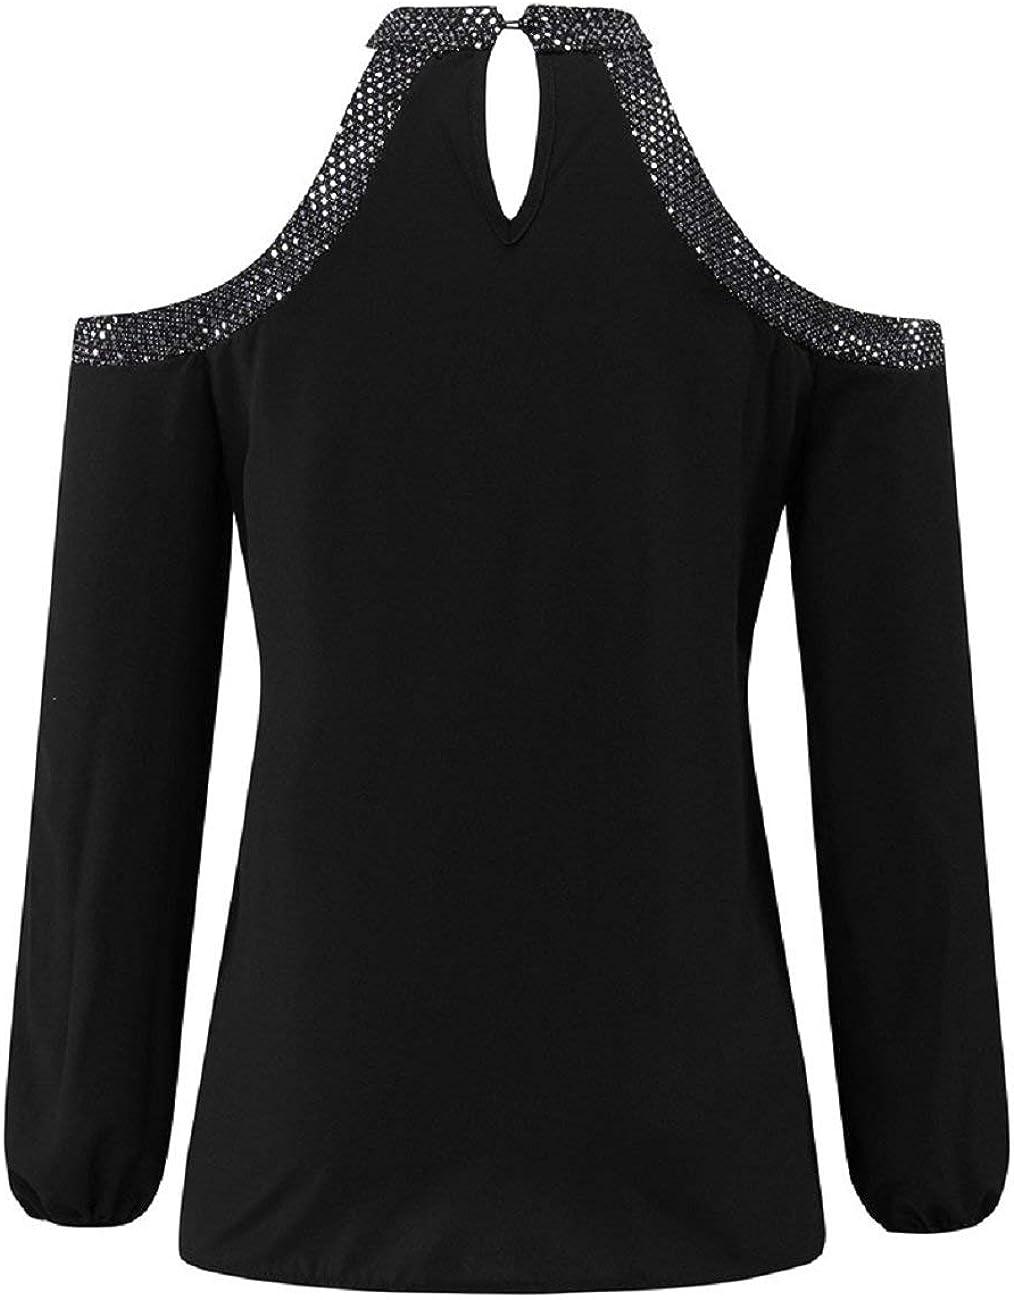 Nicolarisin Cold Shoulder Tops for Women Long Sleeve Blouse Shirts Keyhole Back